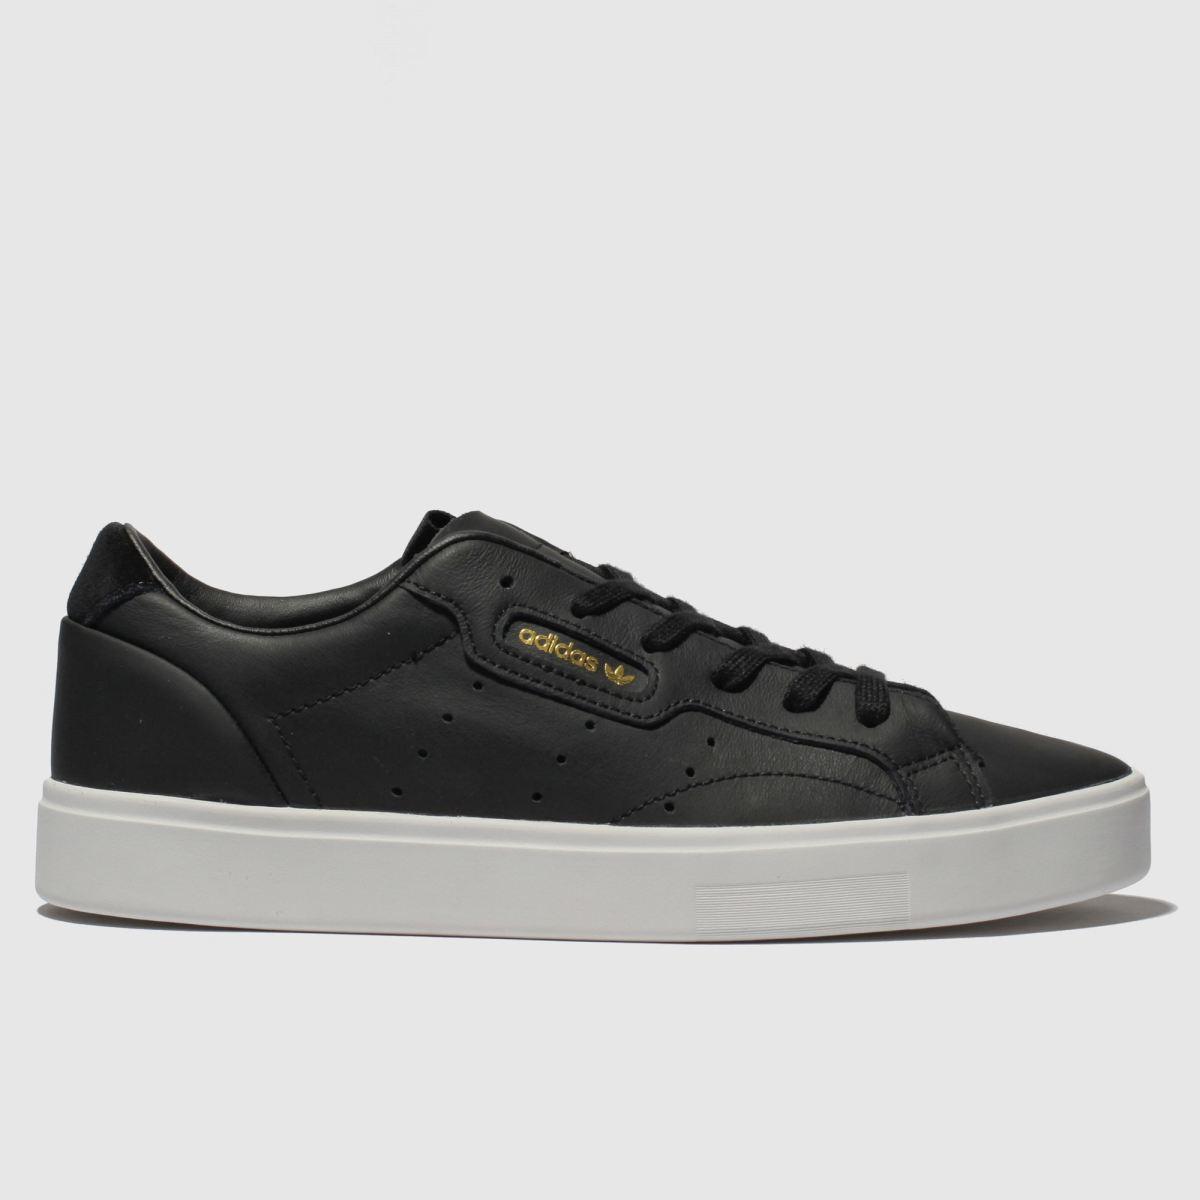 Adidas Black Sleek W Trainers